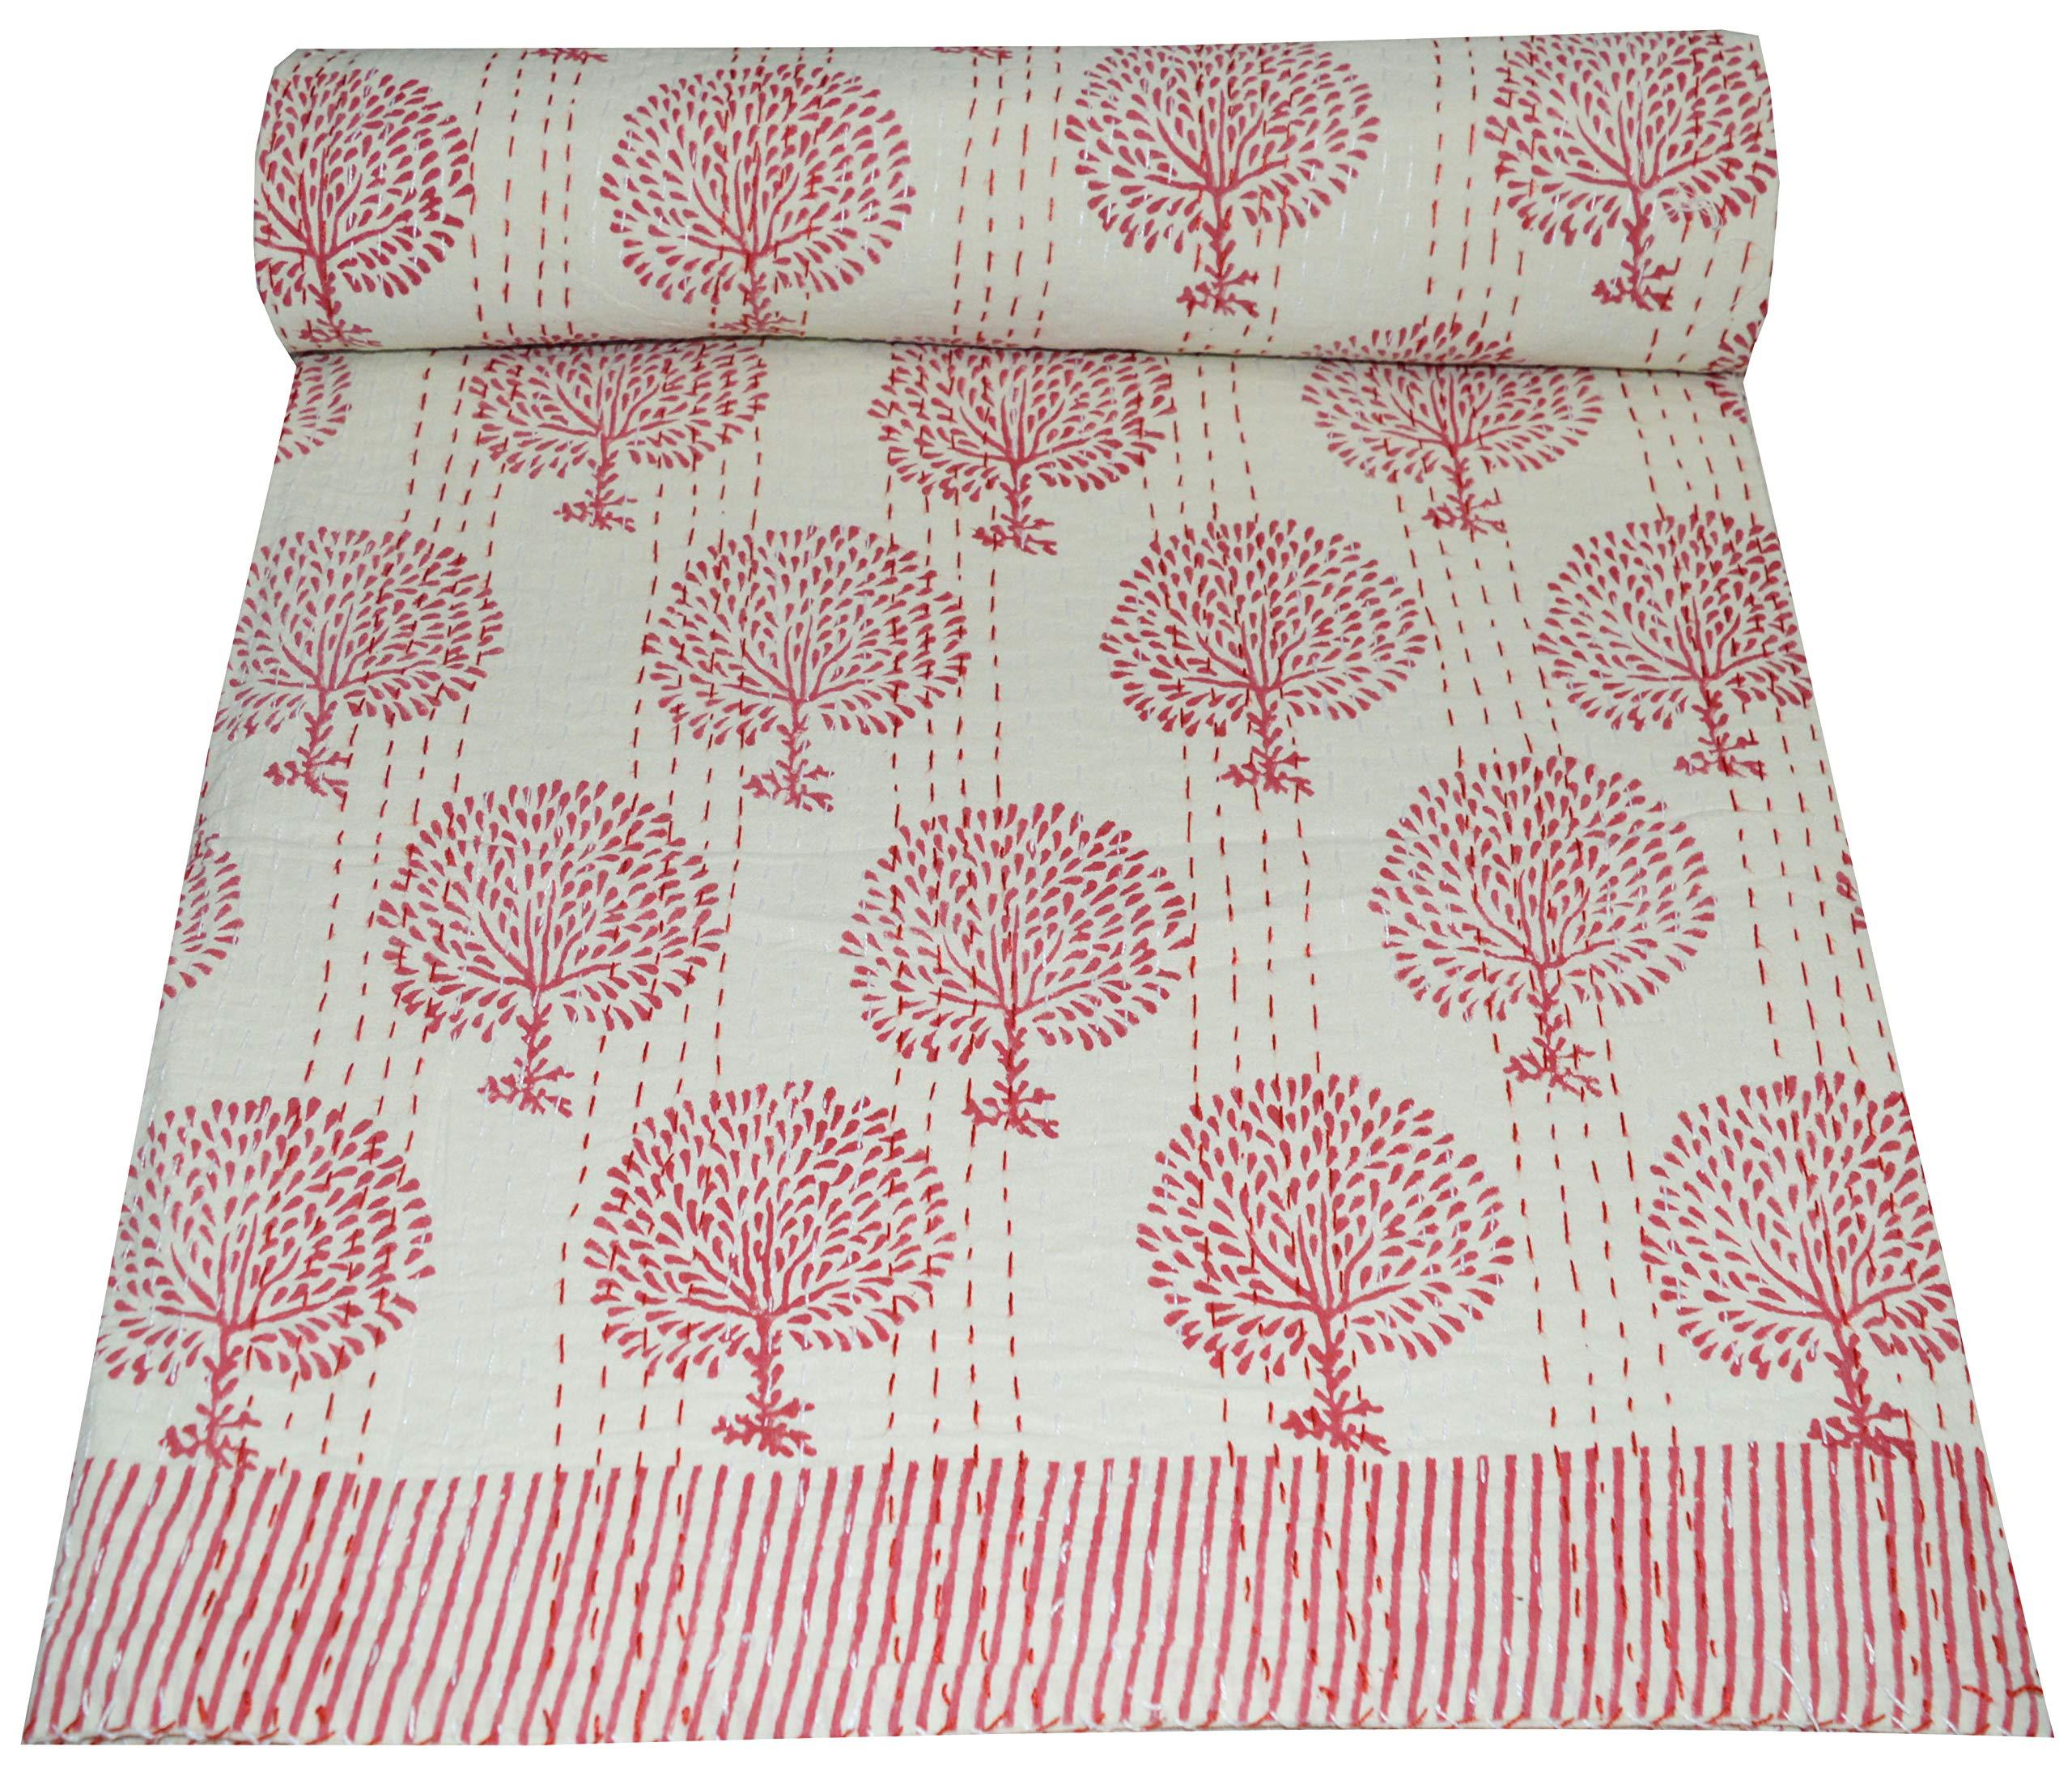 Kantha Quilt Vintage Indian Art  hand block print Bedspread Cotton Bed-cover Blanket Throw Patchwork Handmade Kantha Quilt Coverlet